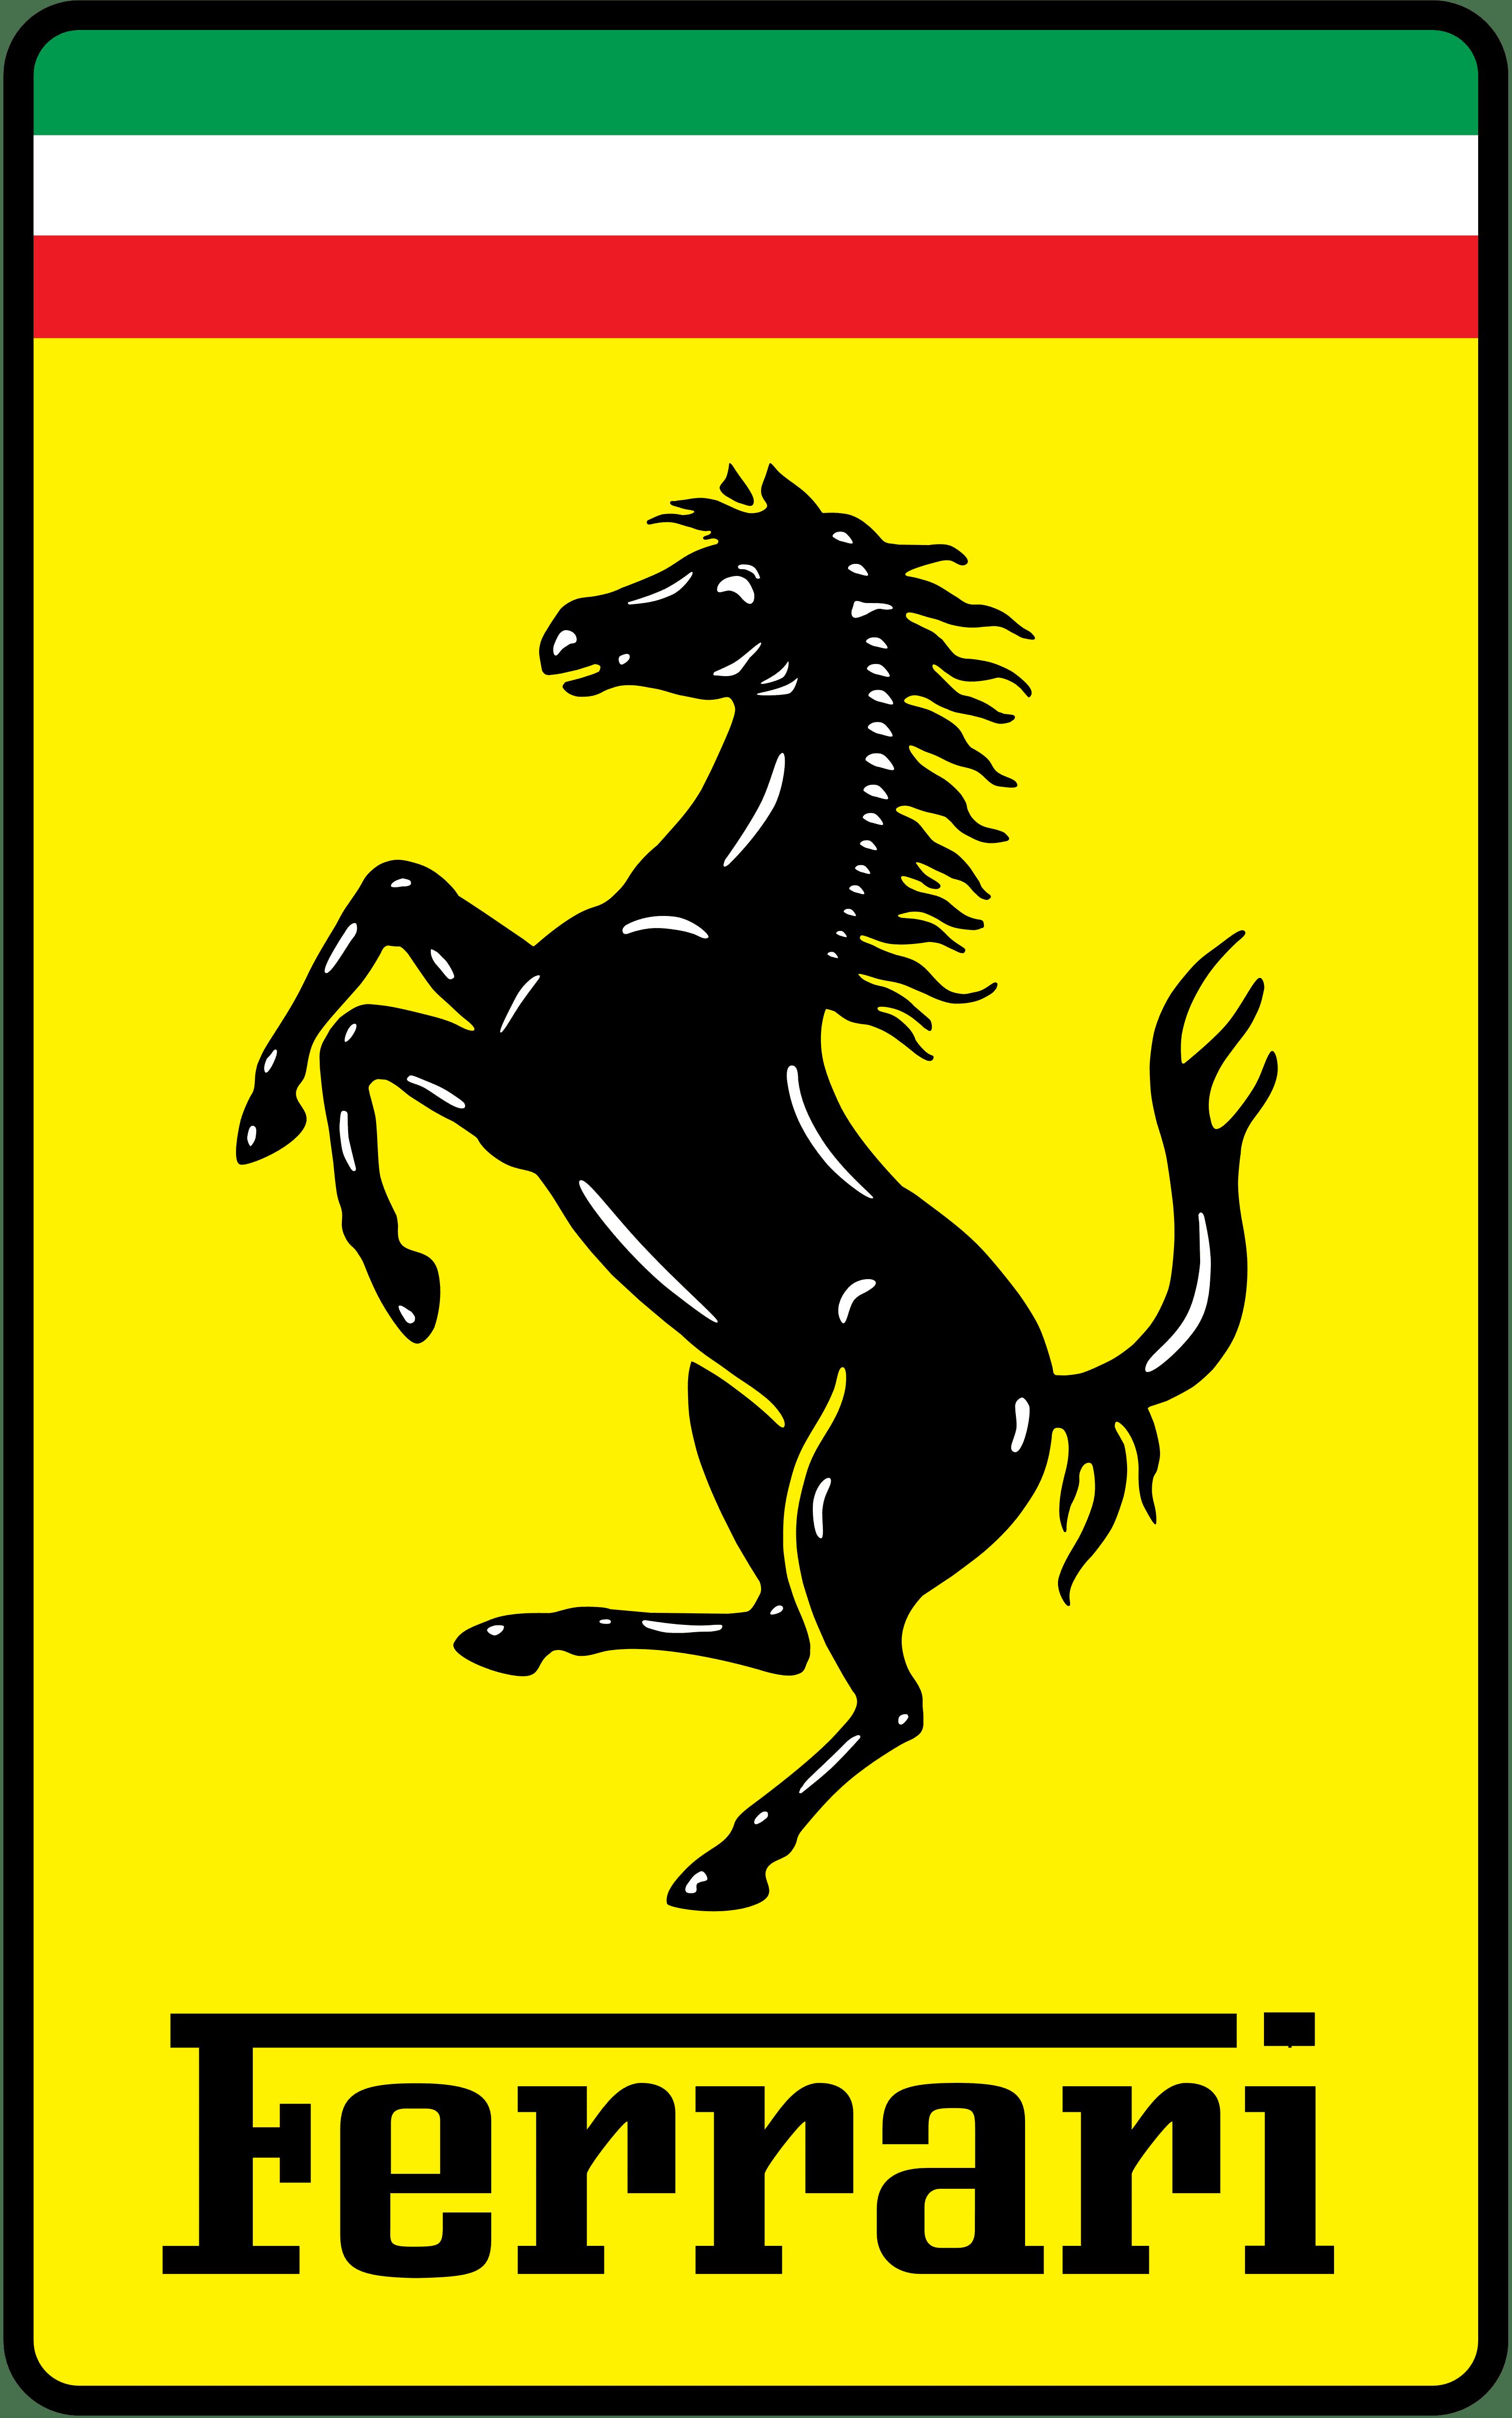 Ferrari Logo Ferrari Symbol Meaning History And Evolution